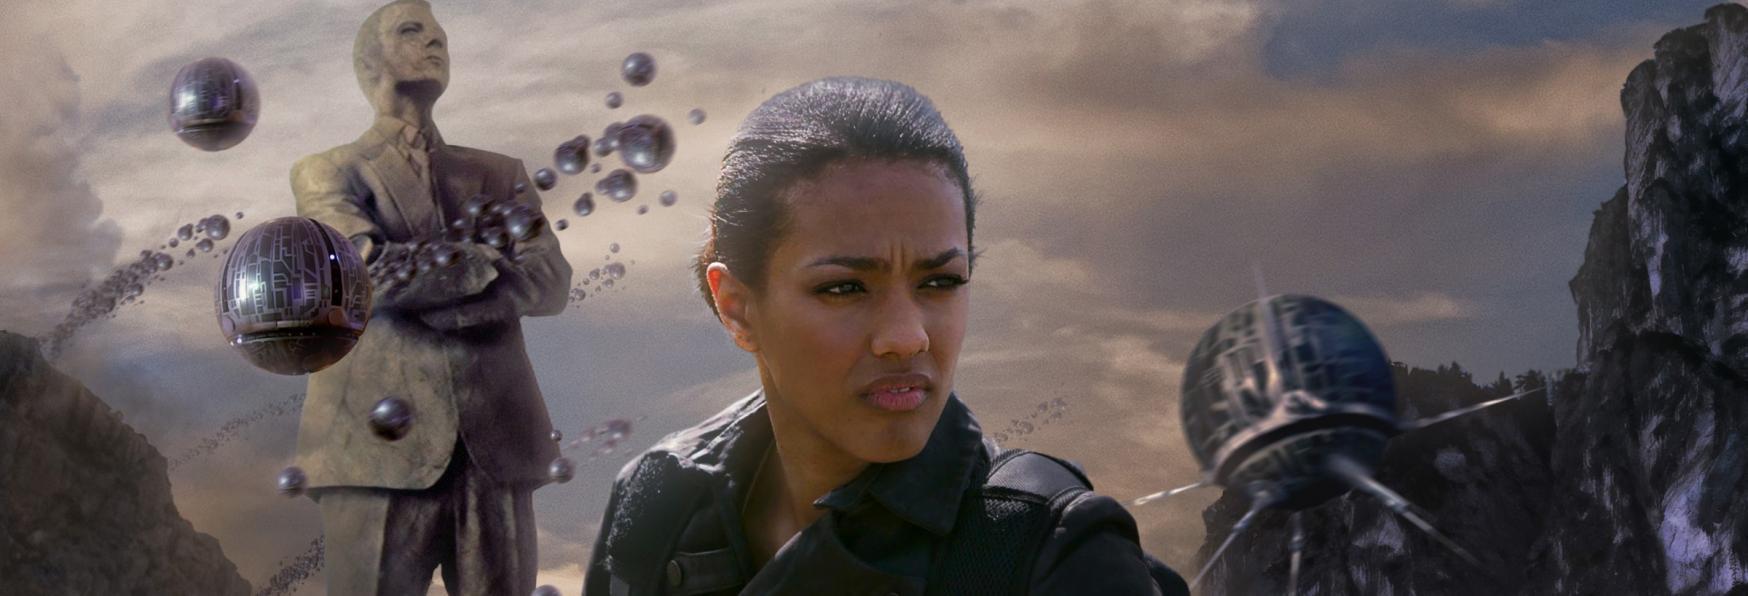 Doctor Who: l'Attrice Freema Agyeman reinterpreterà Martha Jones dopo 10 Anni